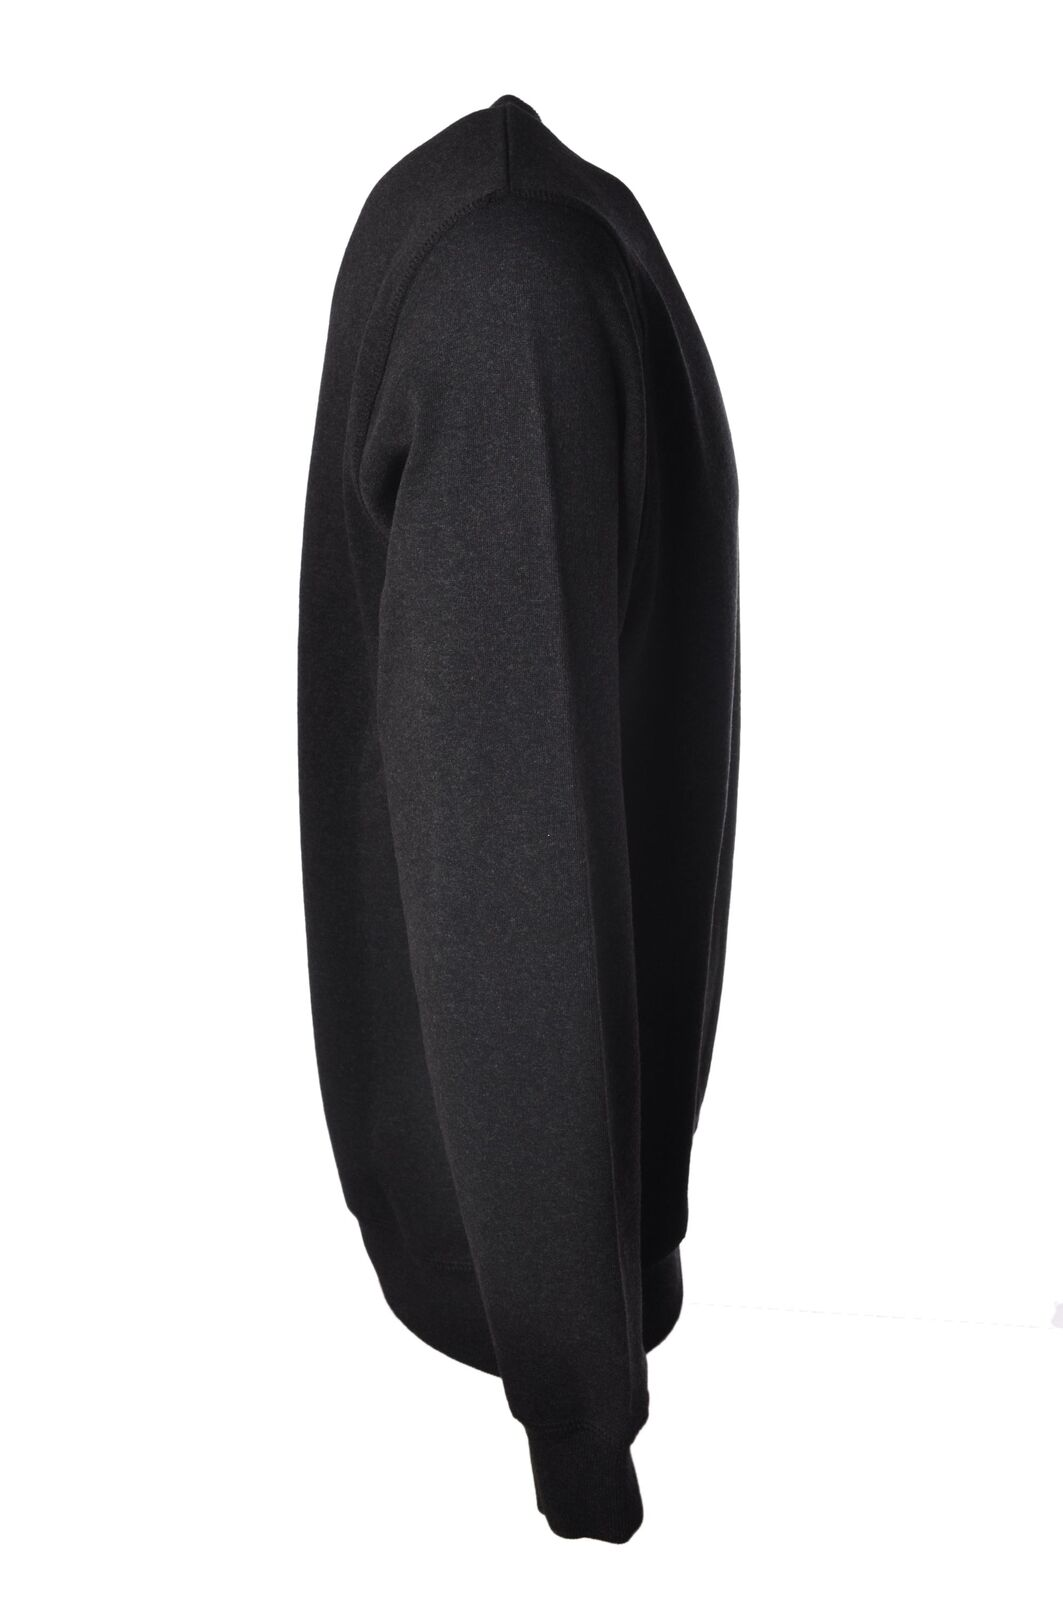 Nwt  sz 495 Polo Ralph Lauren Lana/ Cashmere Sweater sz  M 1a39bb